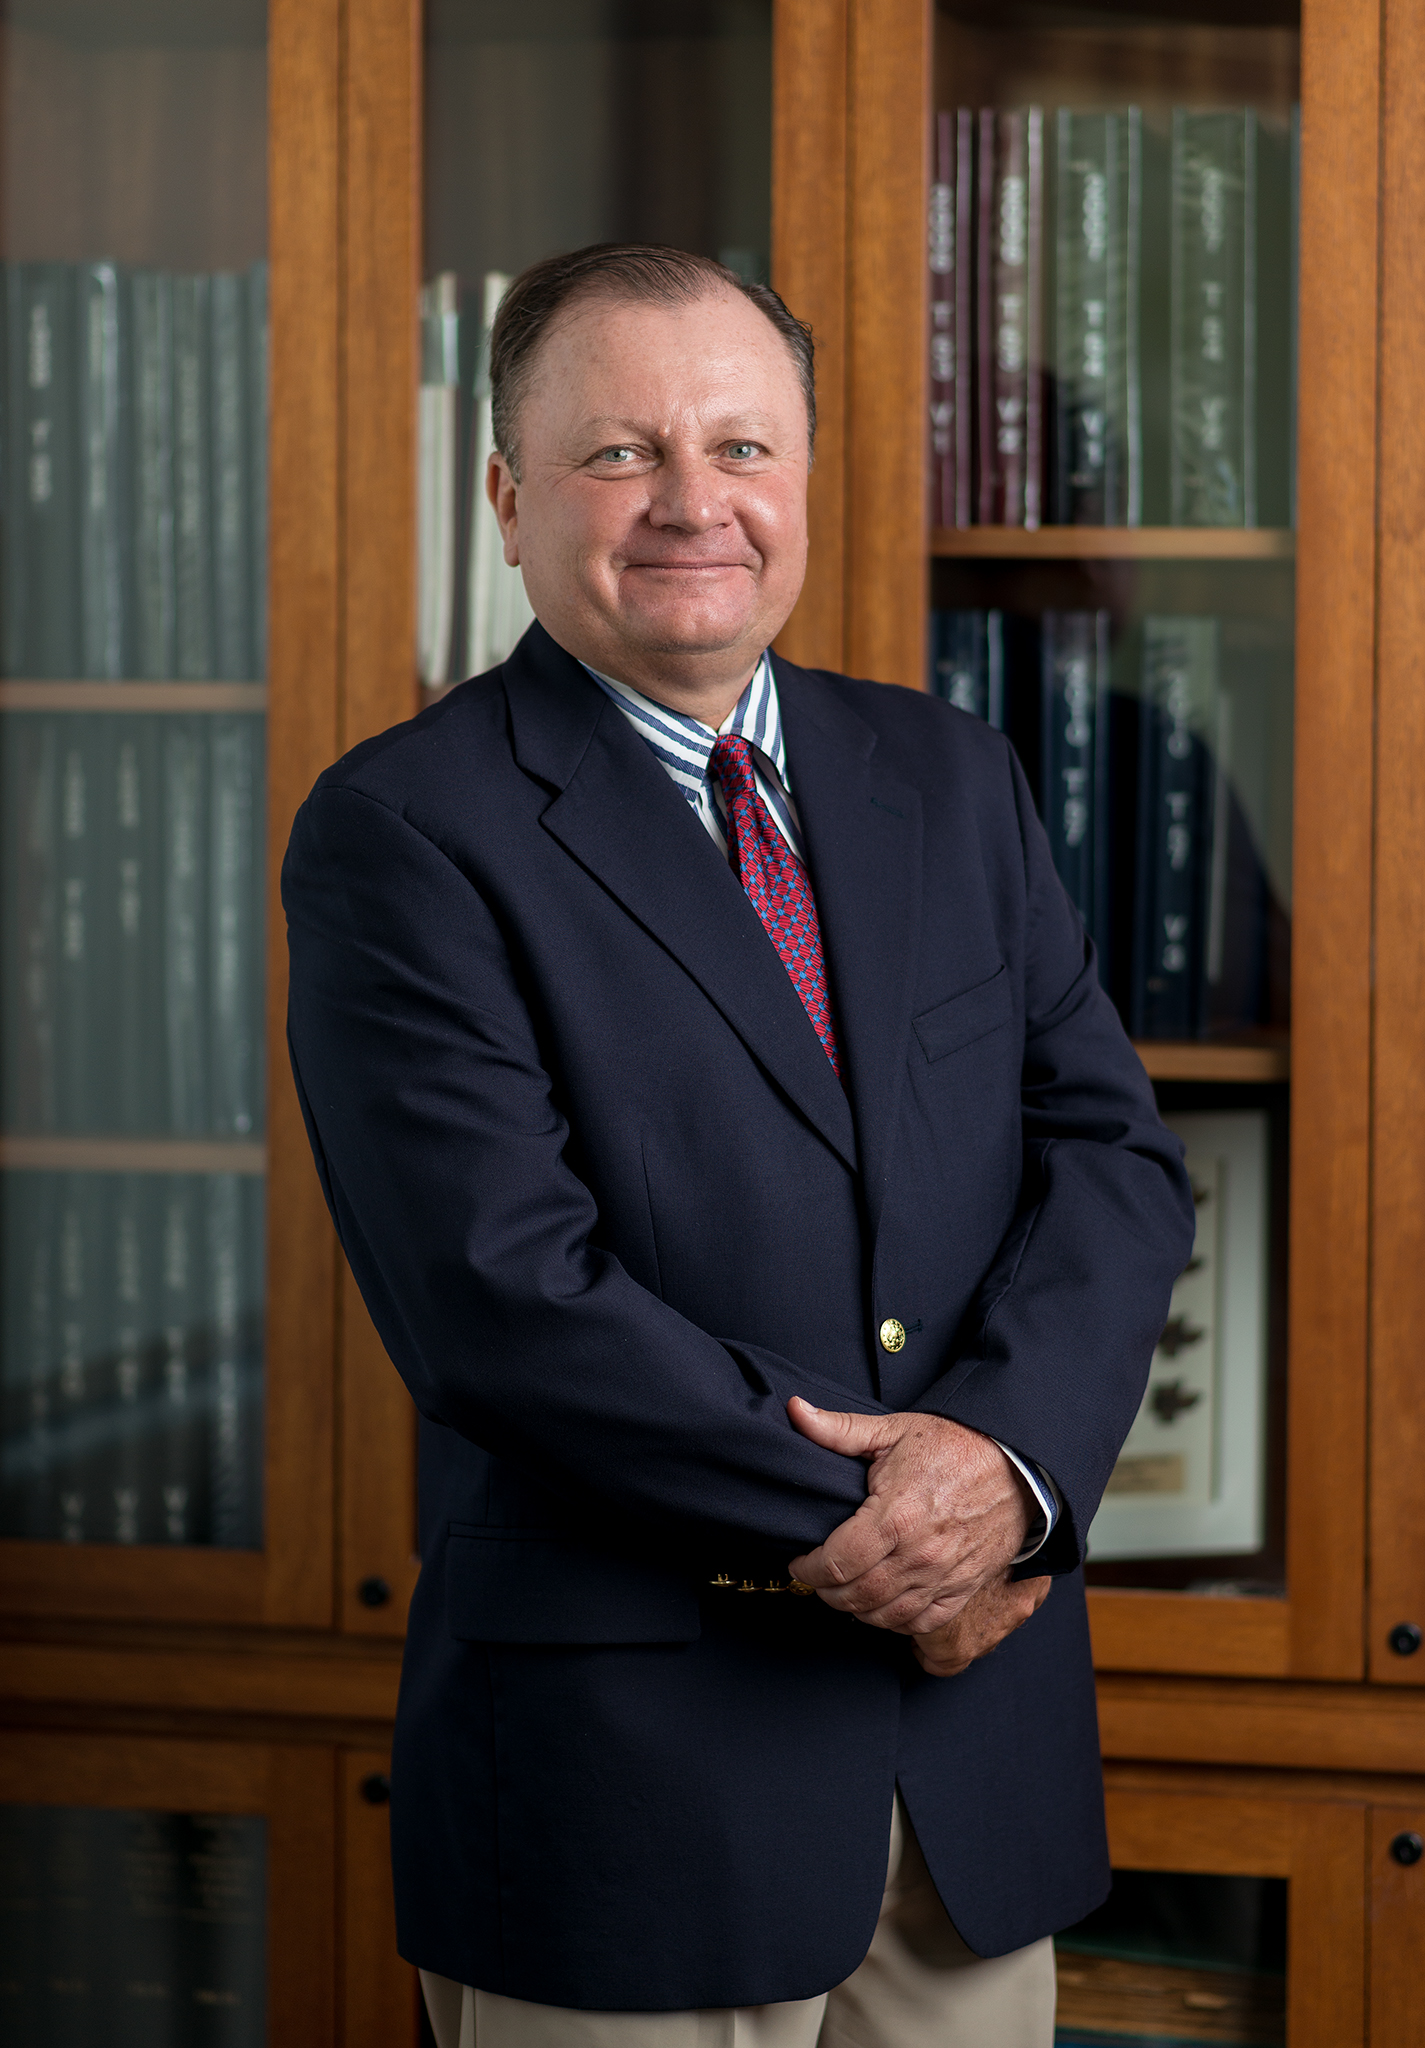 Jacob M. Wegrzyn